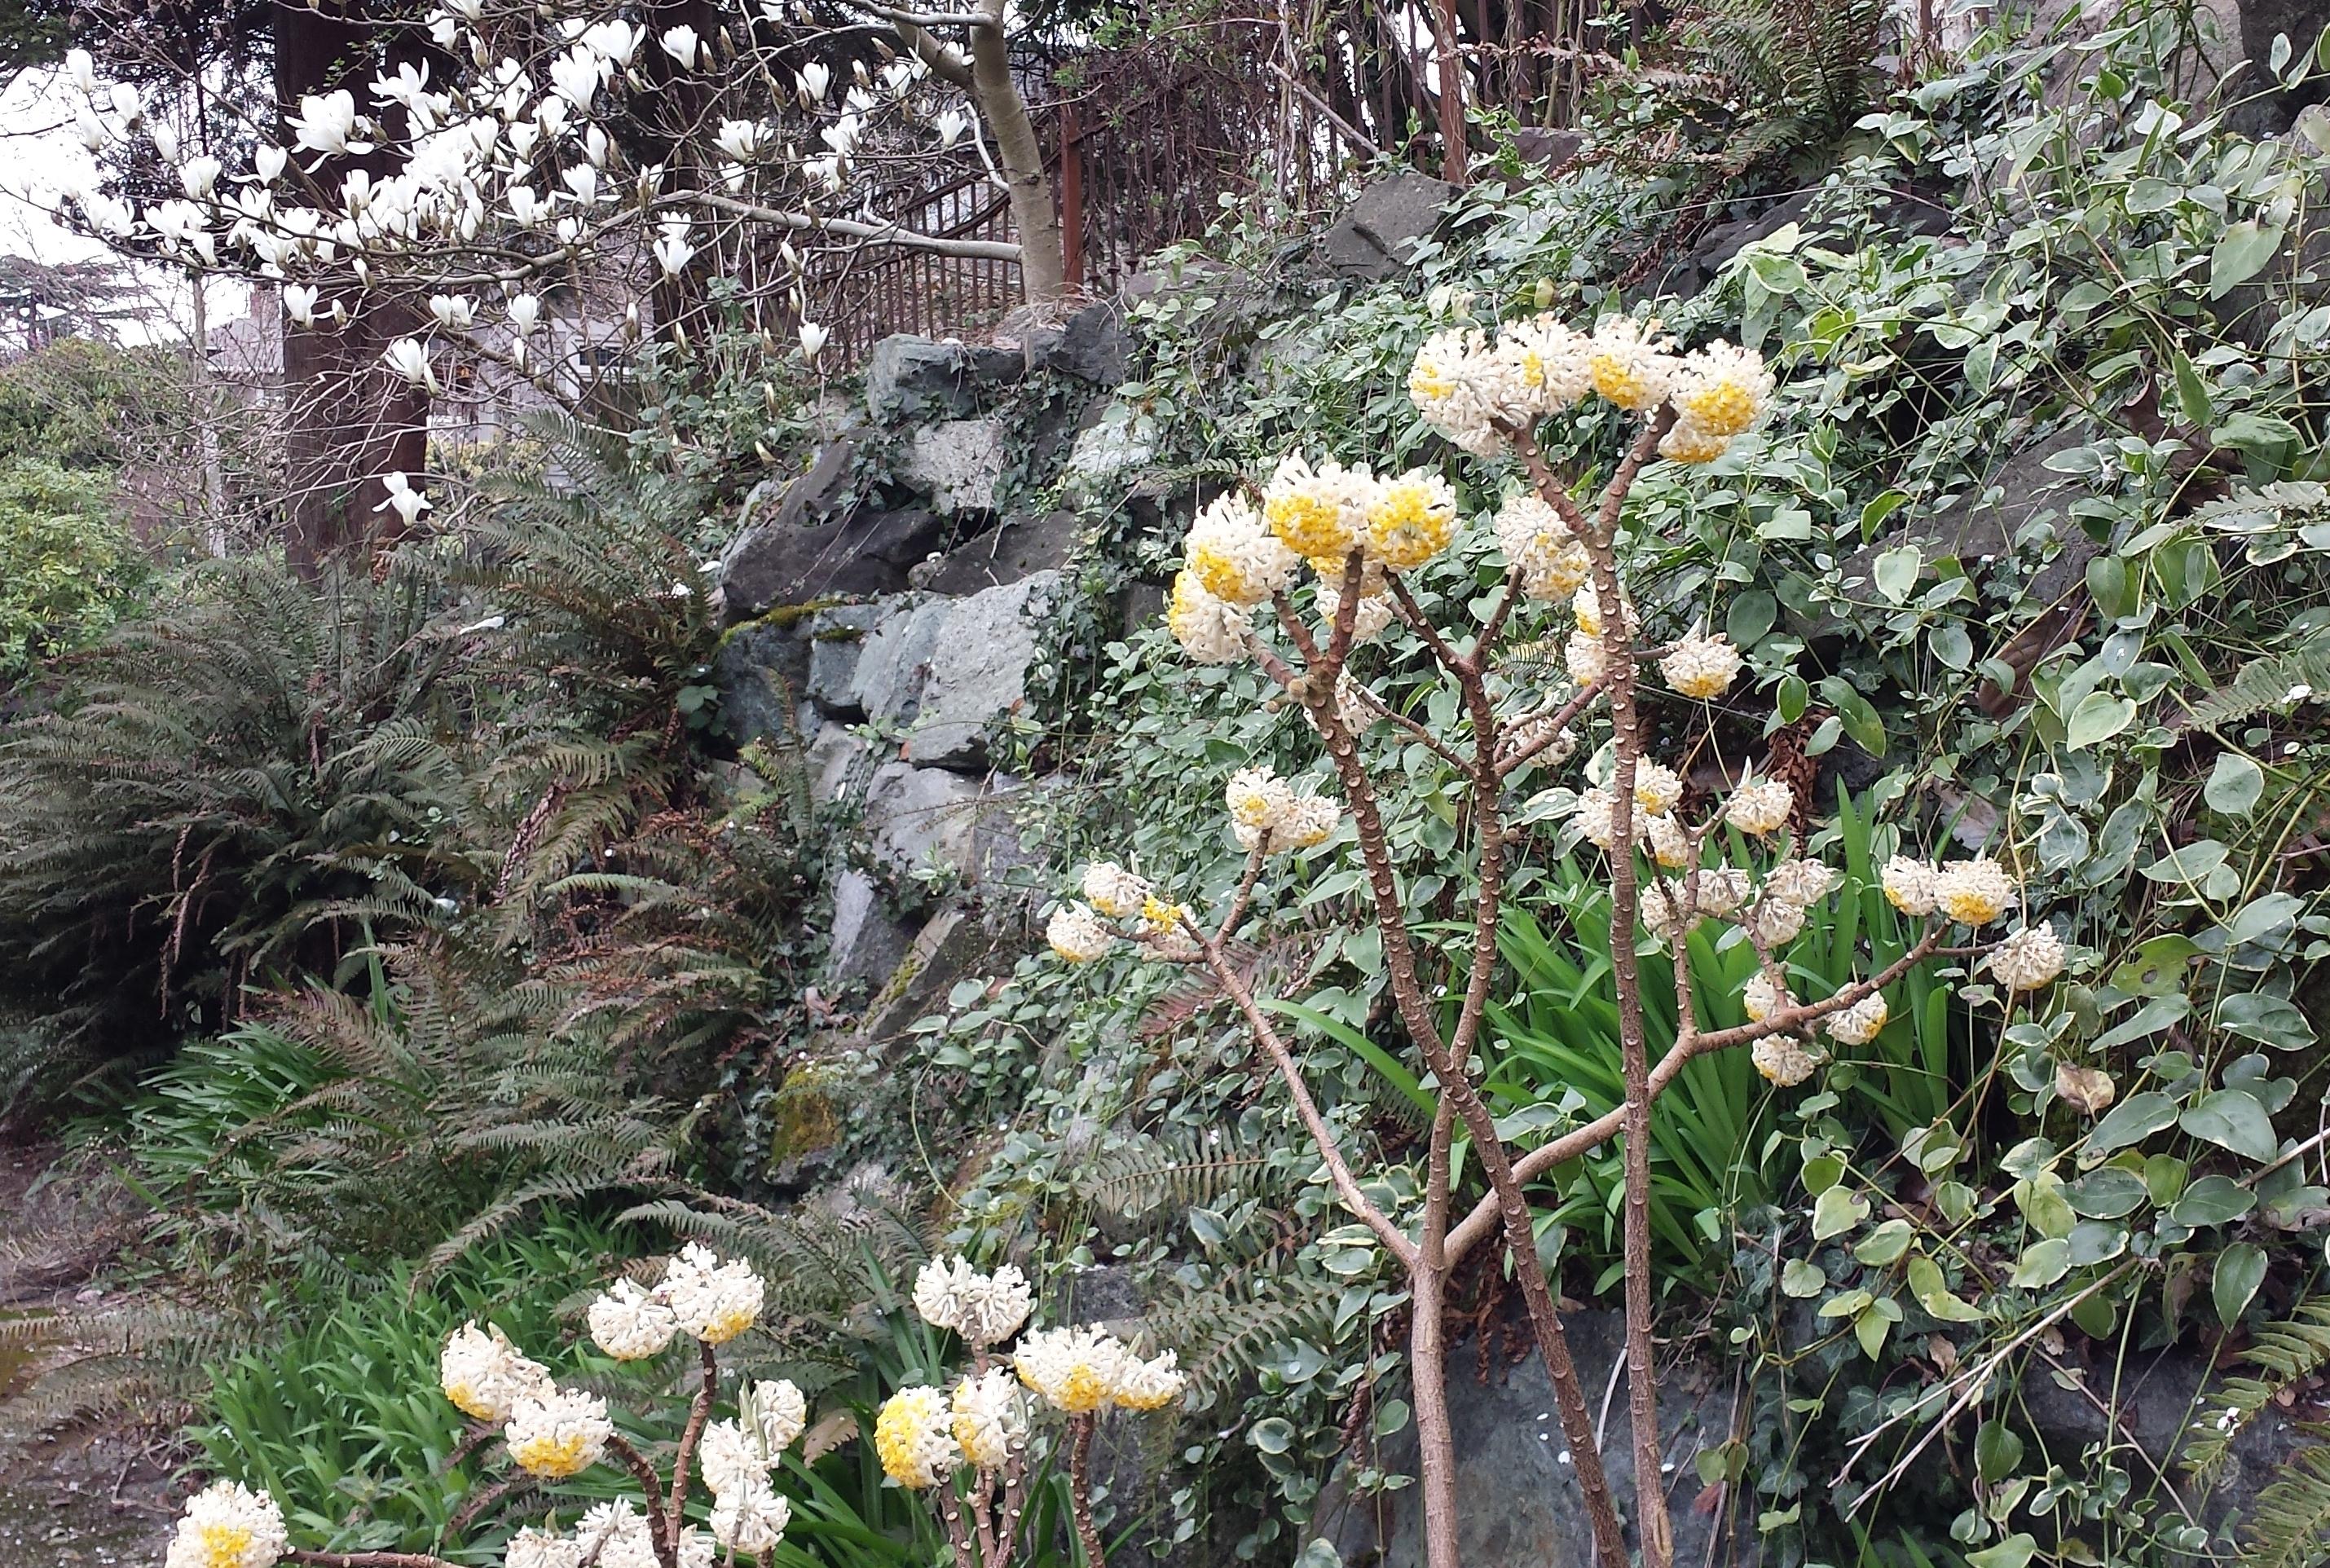 Edgworthia chrysantha wide